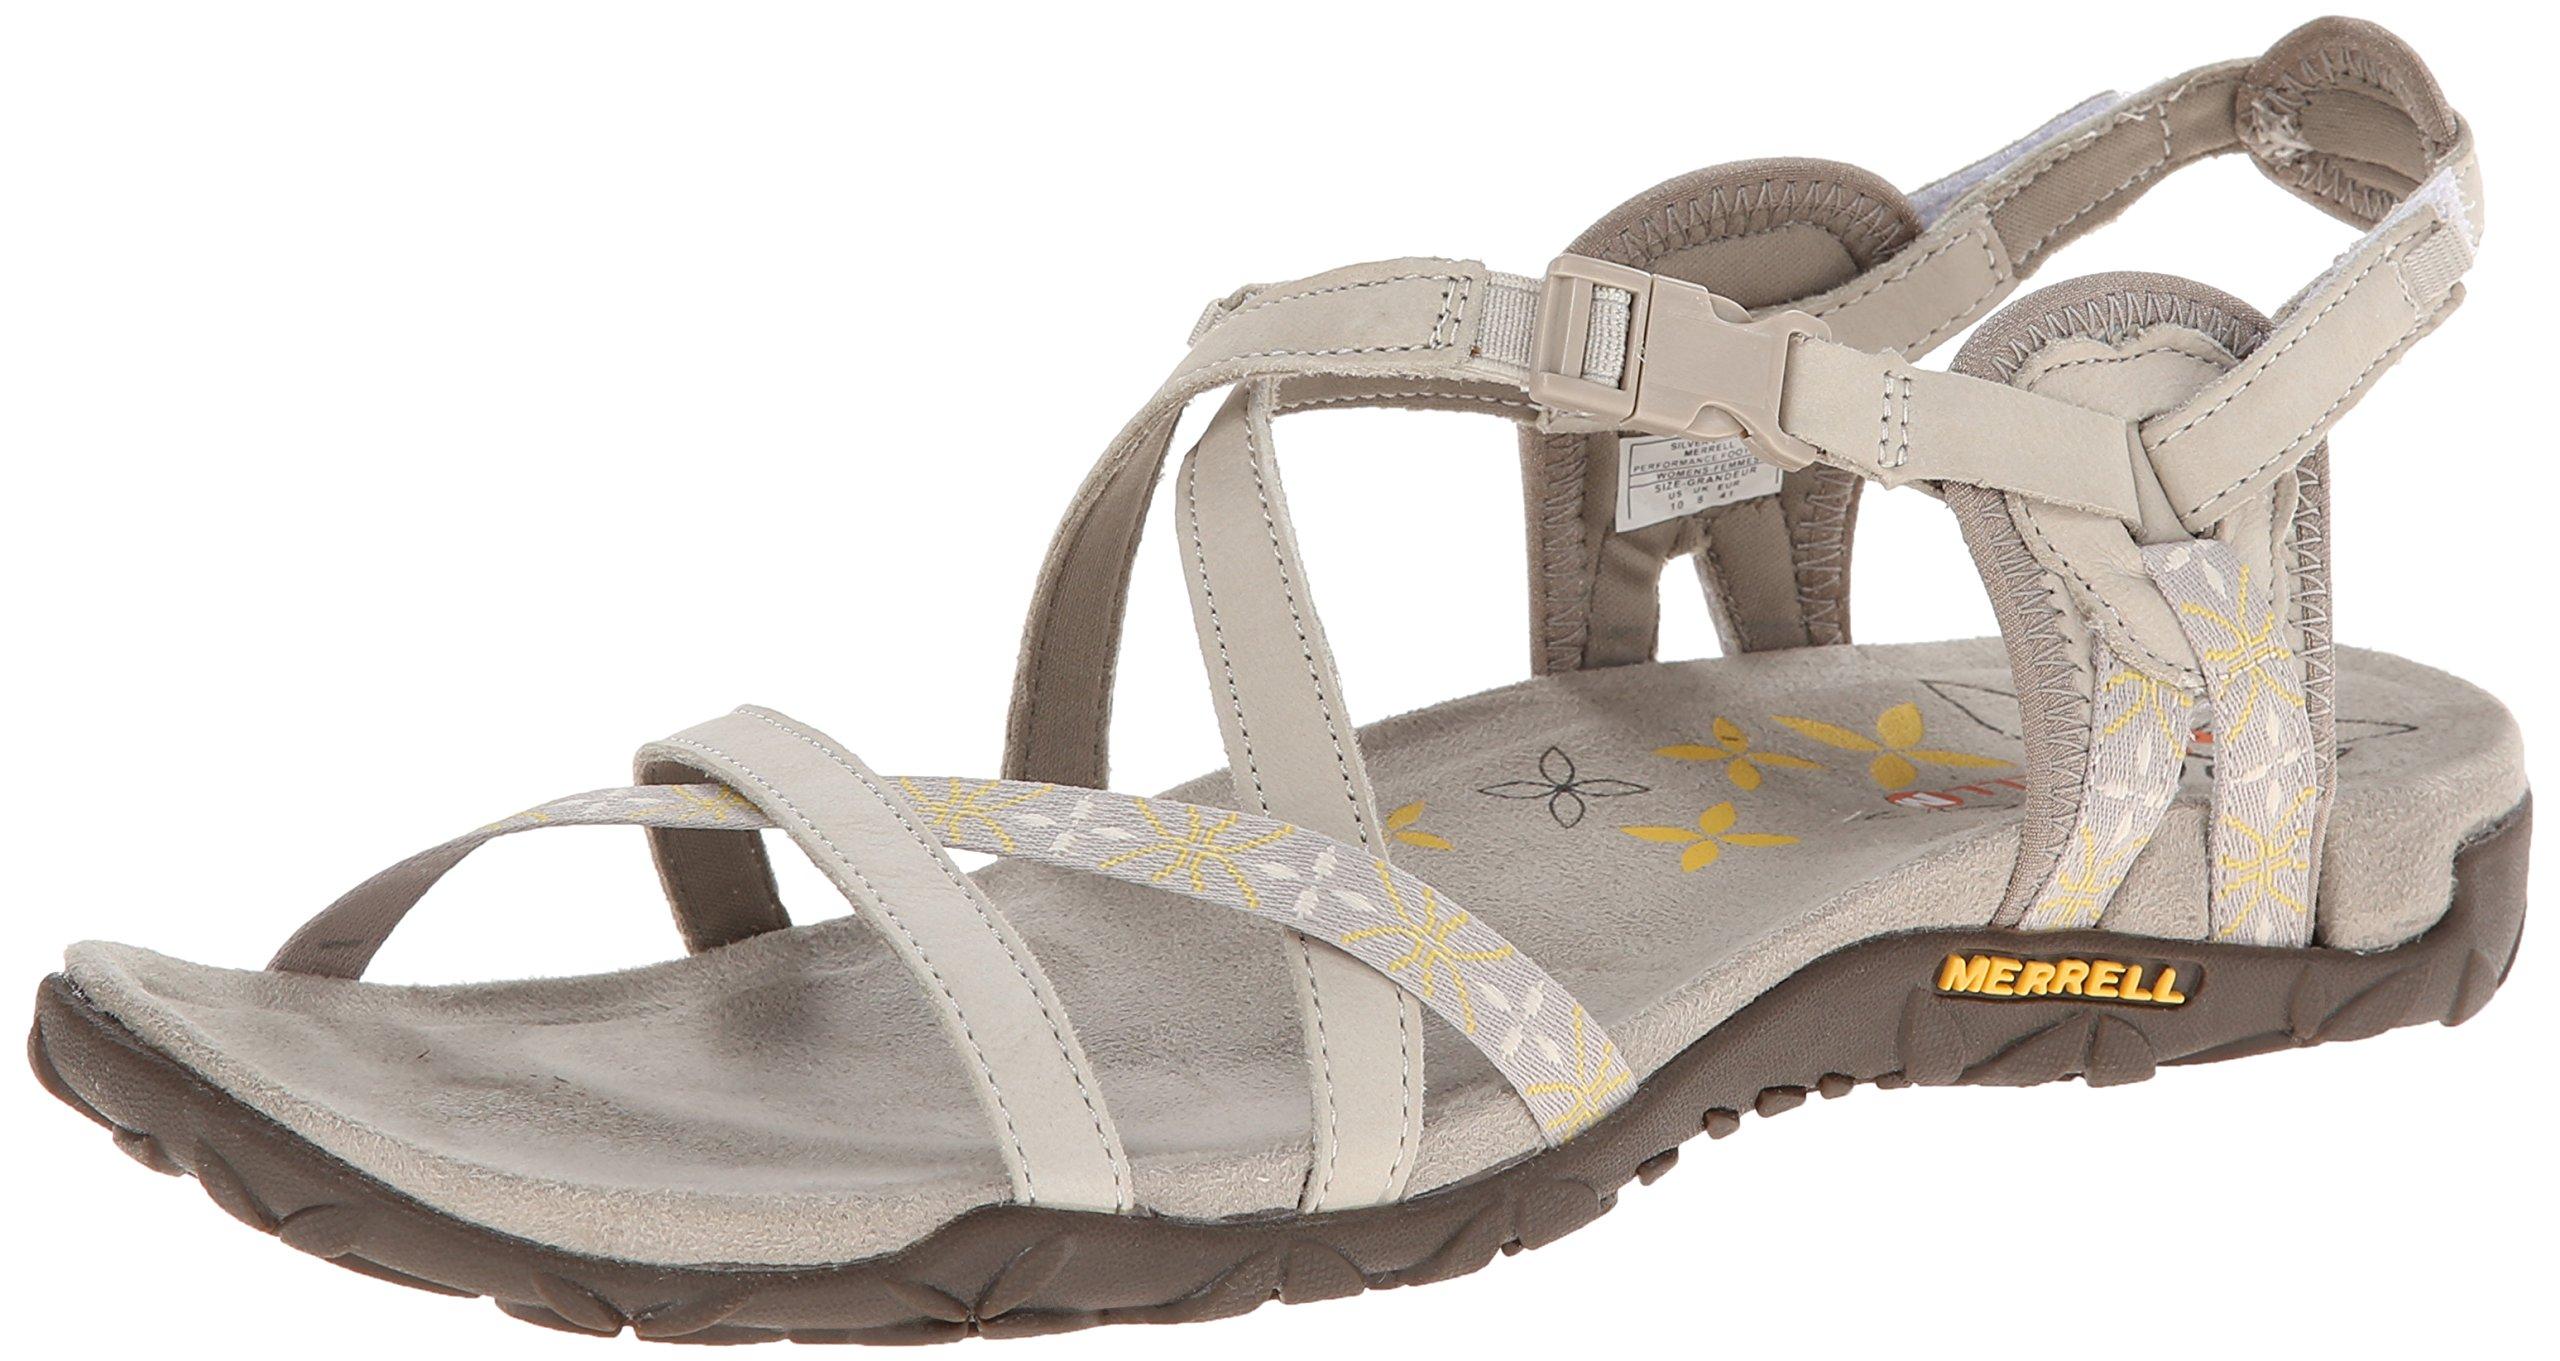 Merrell Women's Terran Lattice Sandal,Silver Lining,7 M US